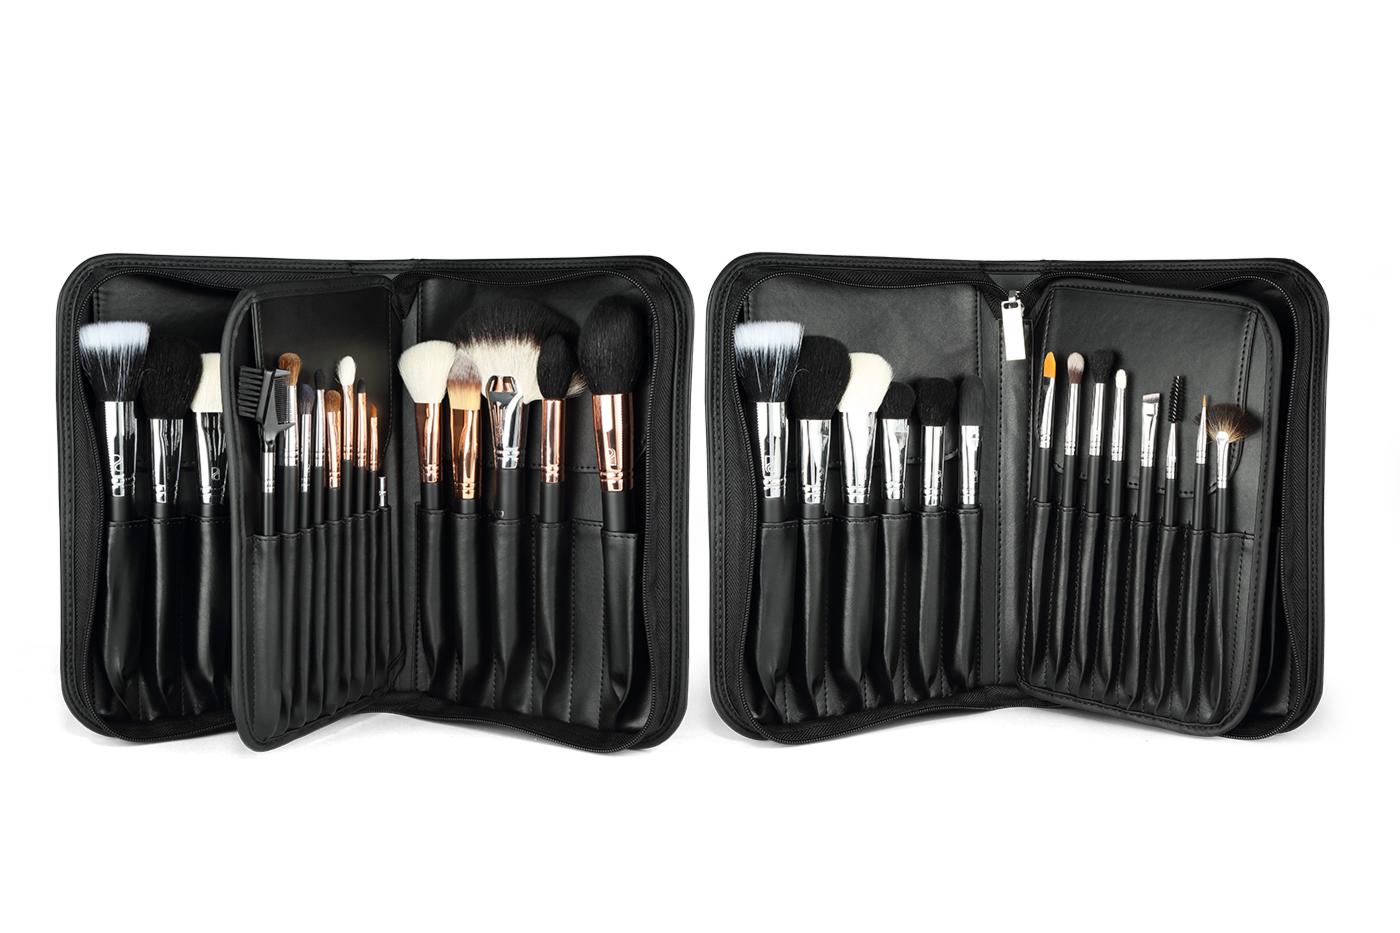 Proarte presents professional brush set